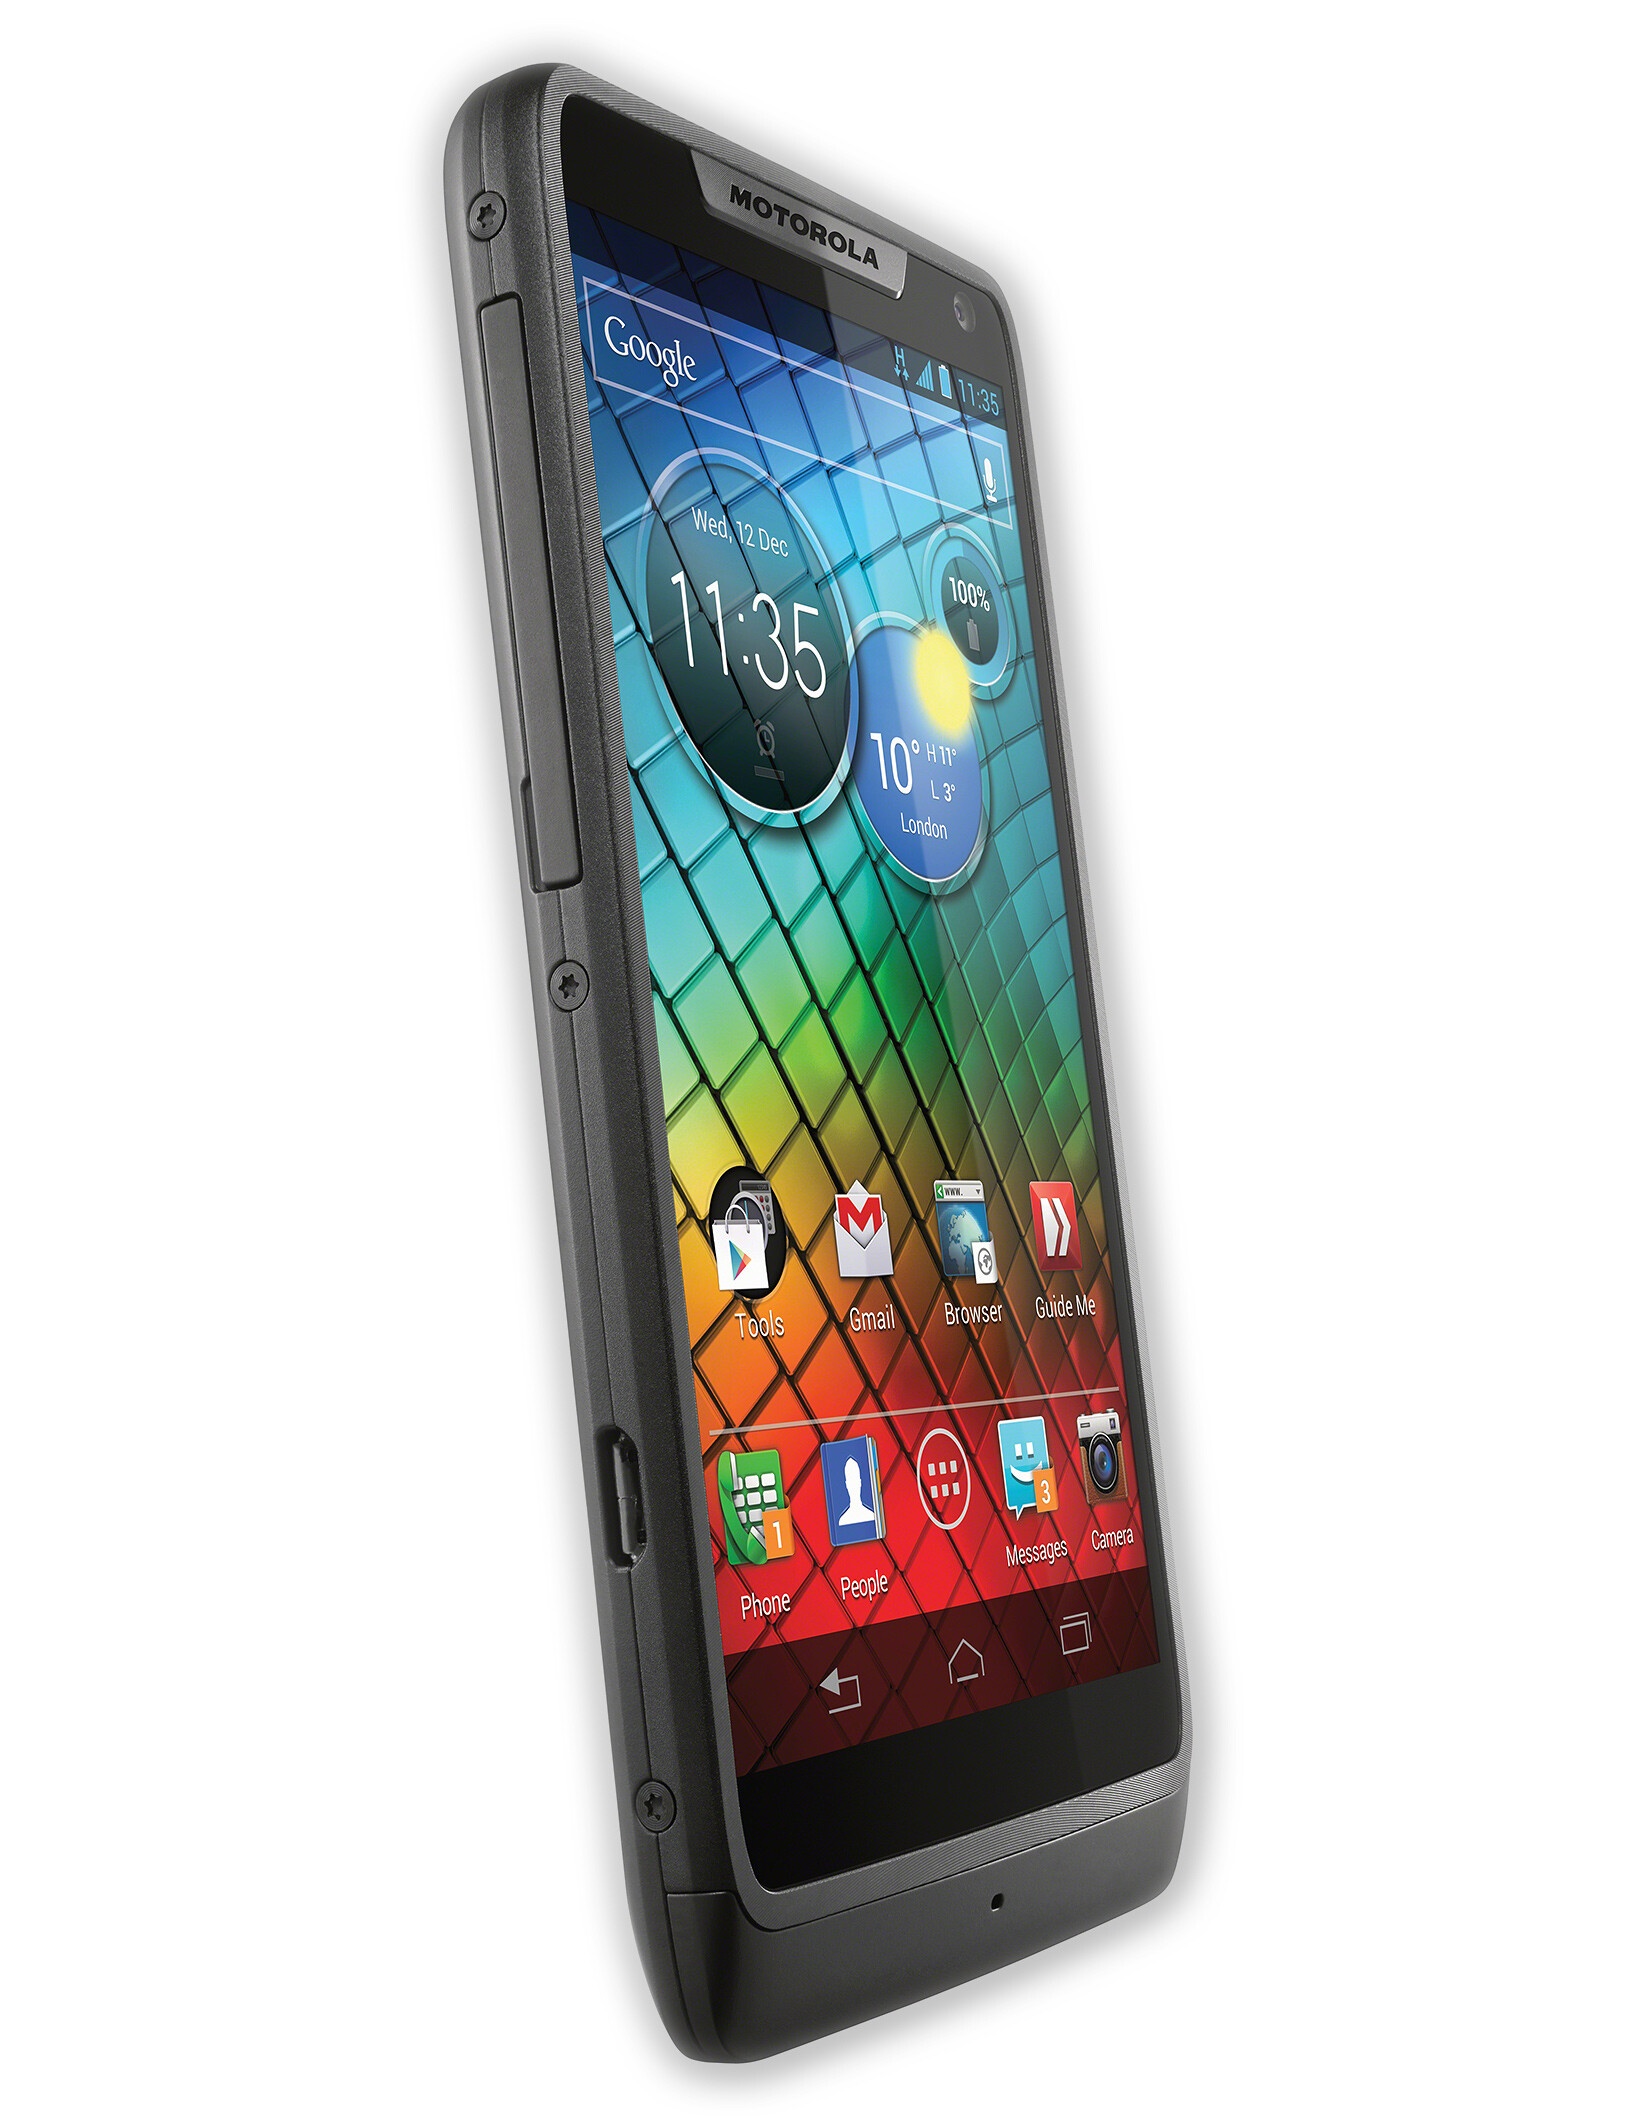 Eclipse not recogniz the android device Motorola Droid Razr Maxx hd